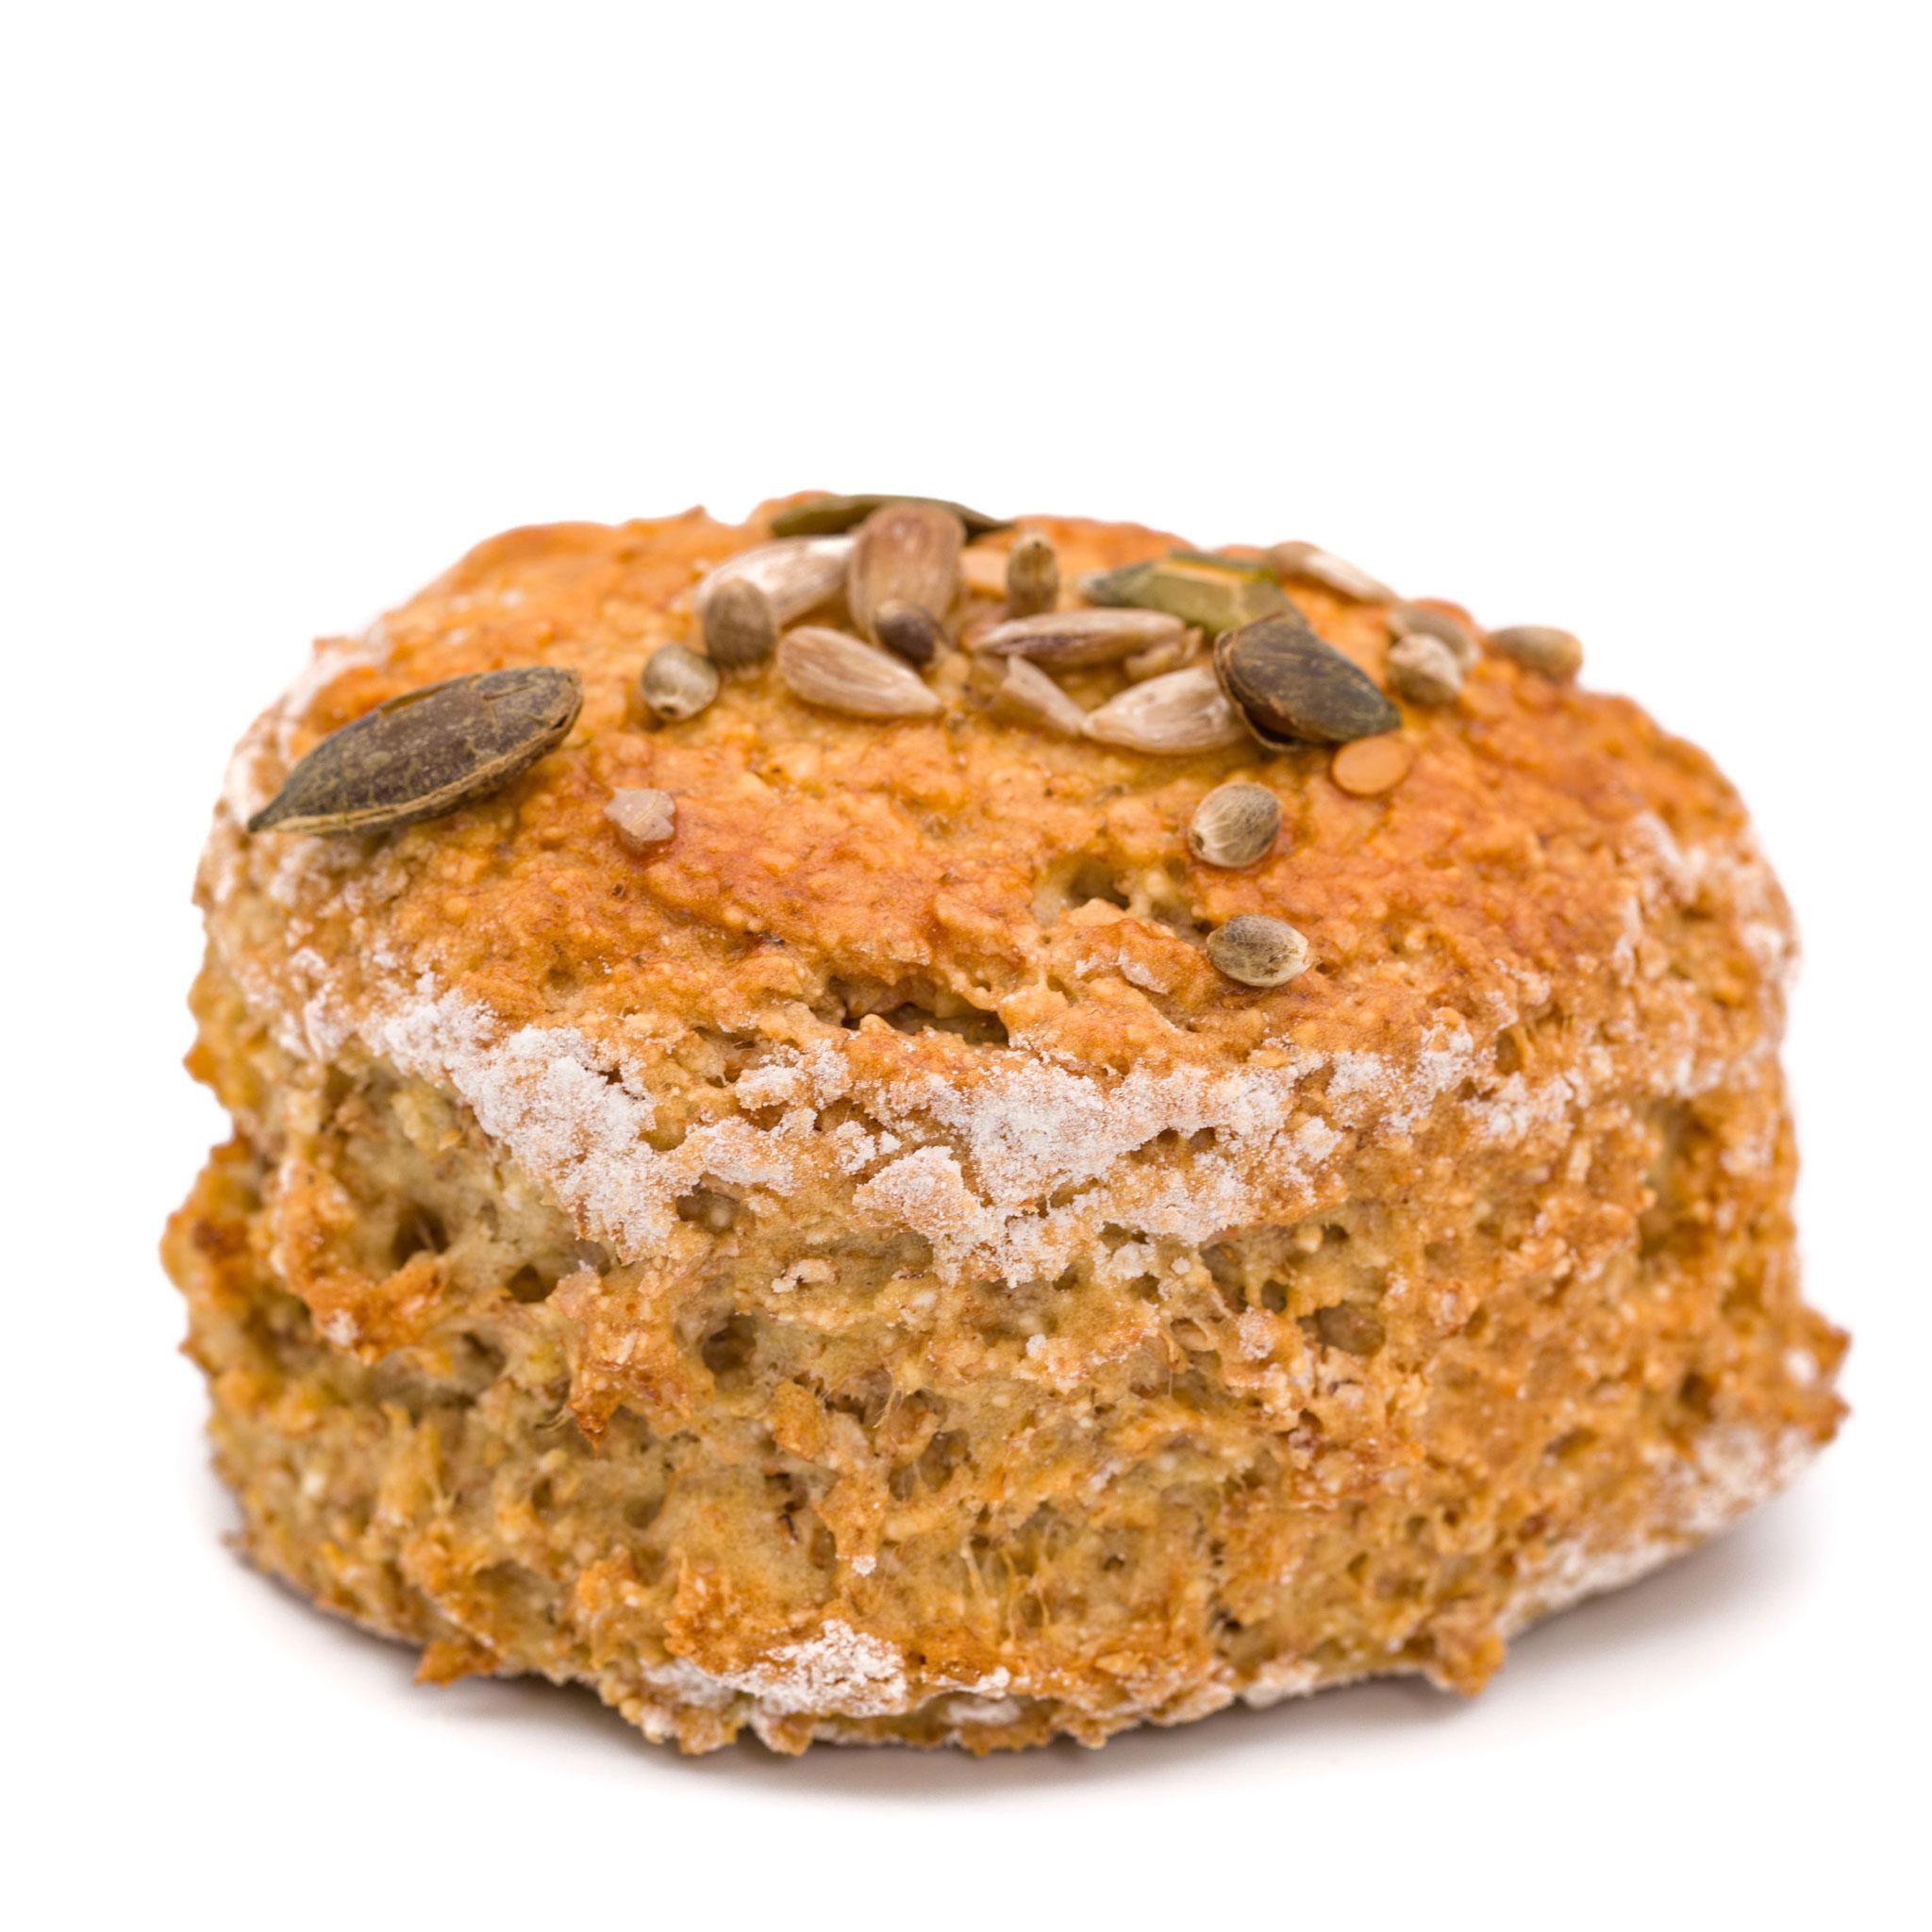 brown bread scones on white background